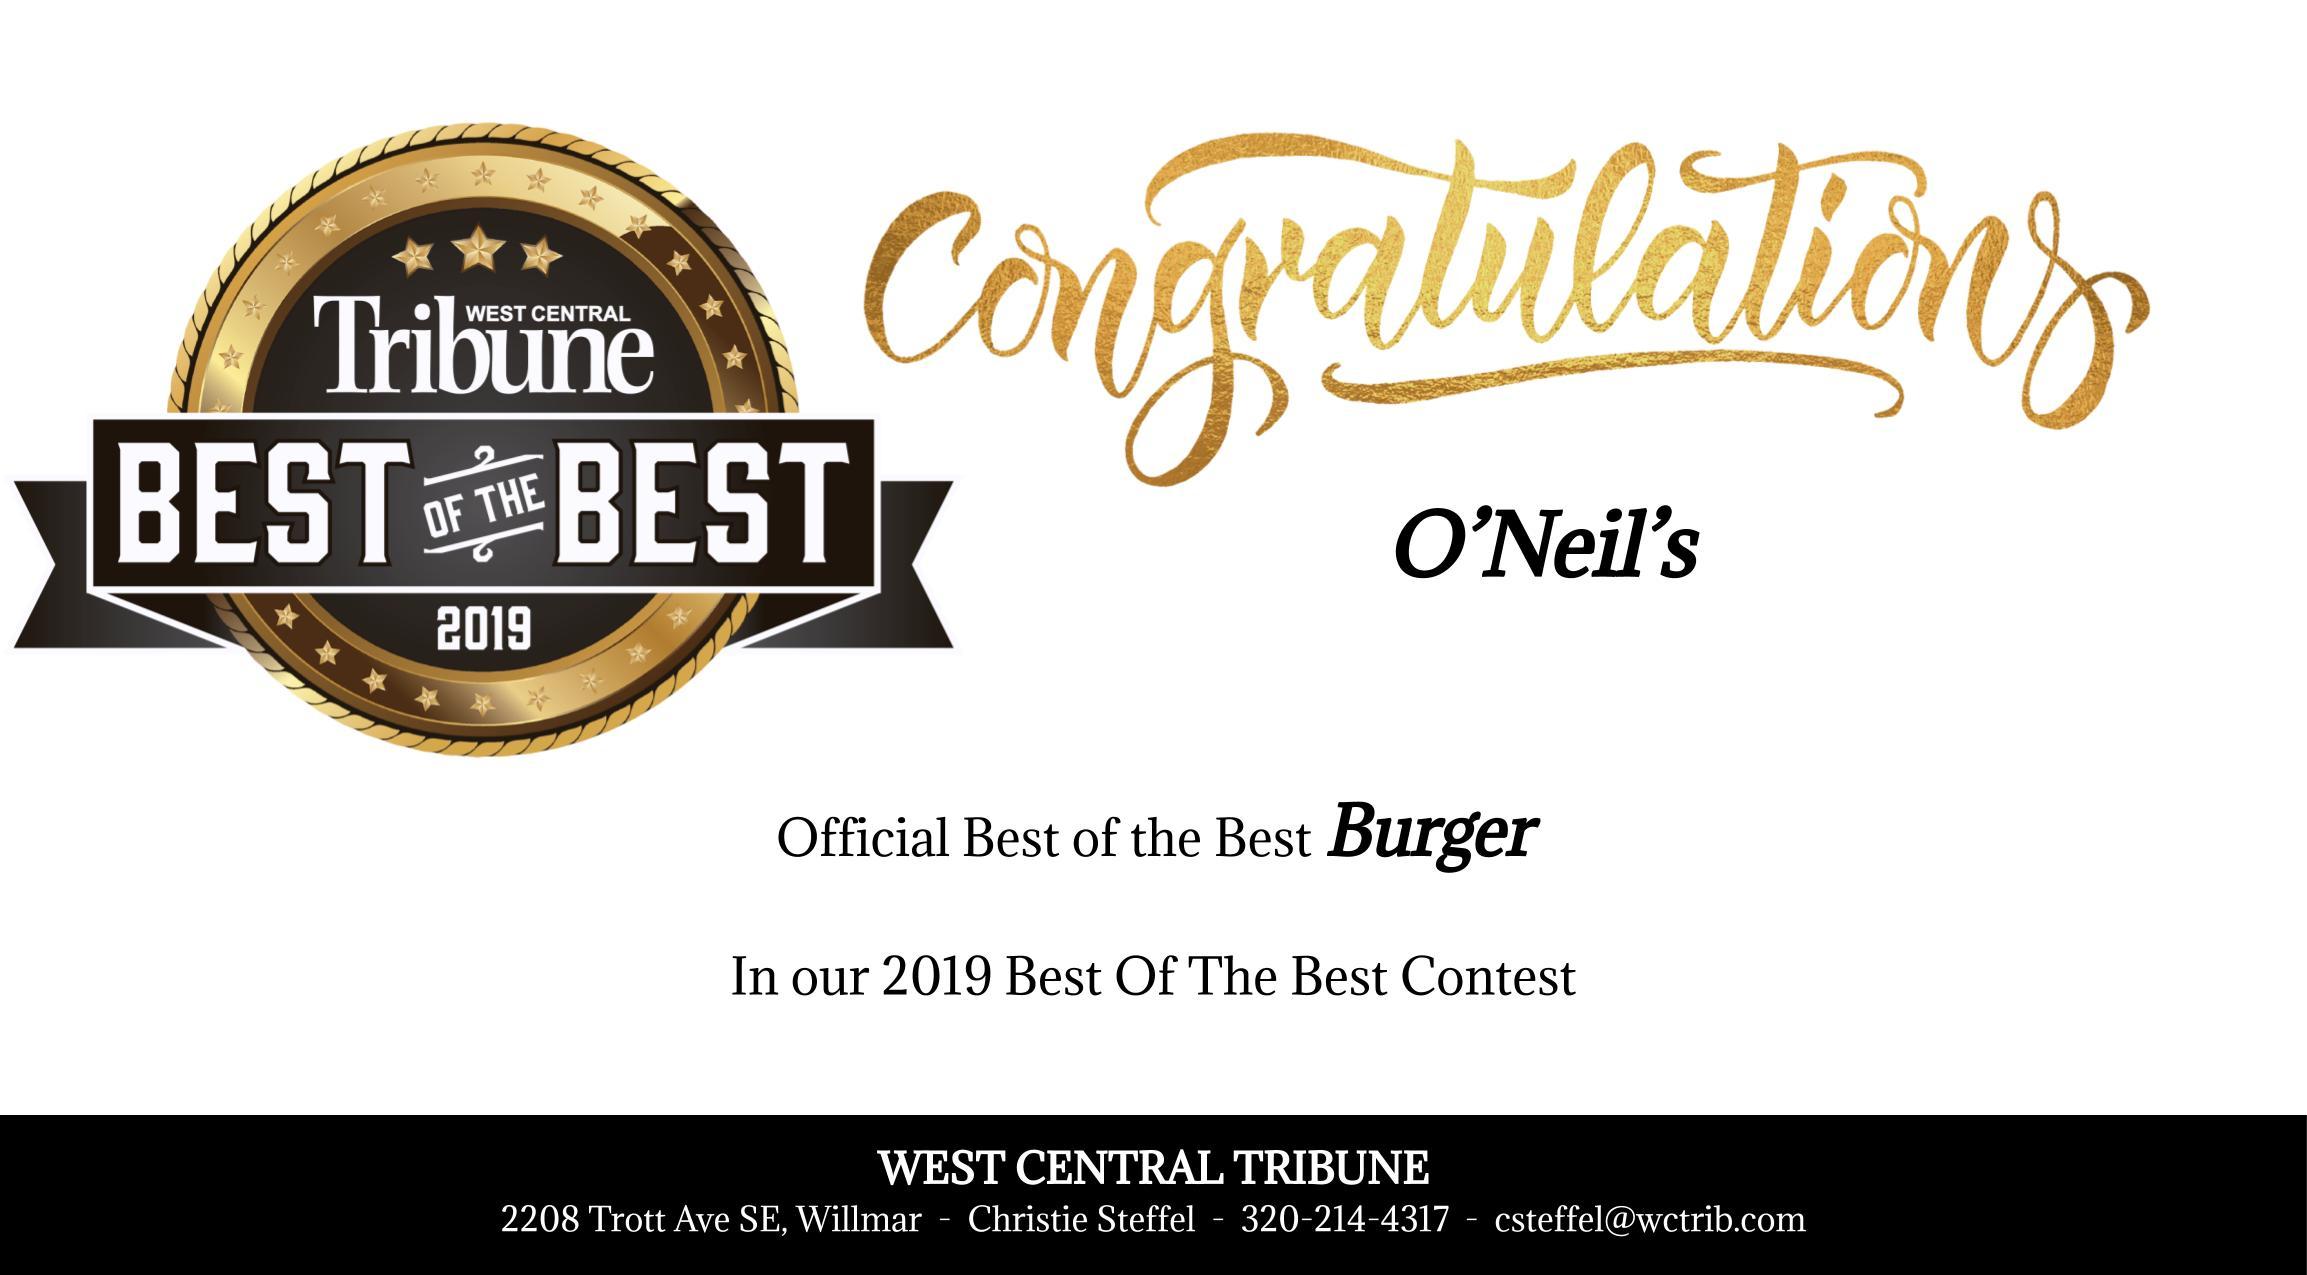 O'Neil's - Burger.jpg